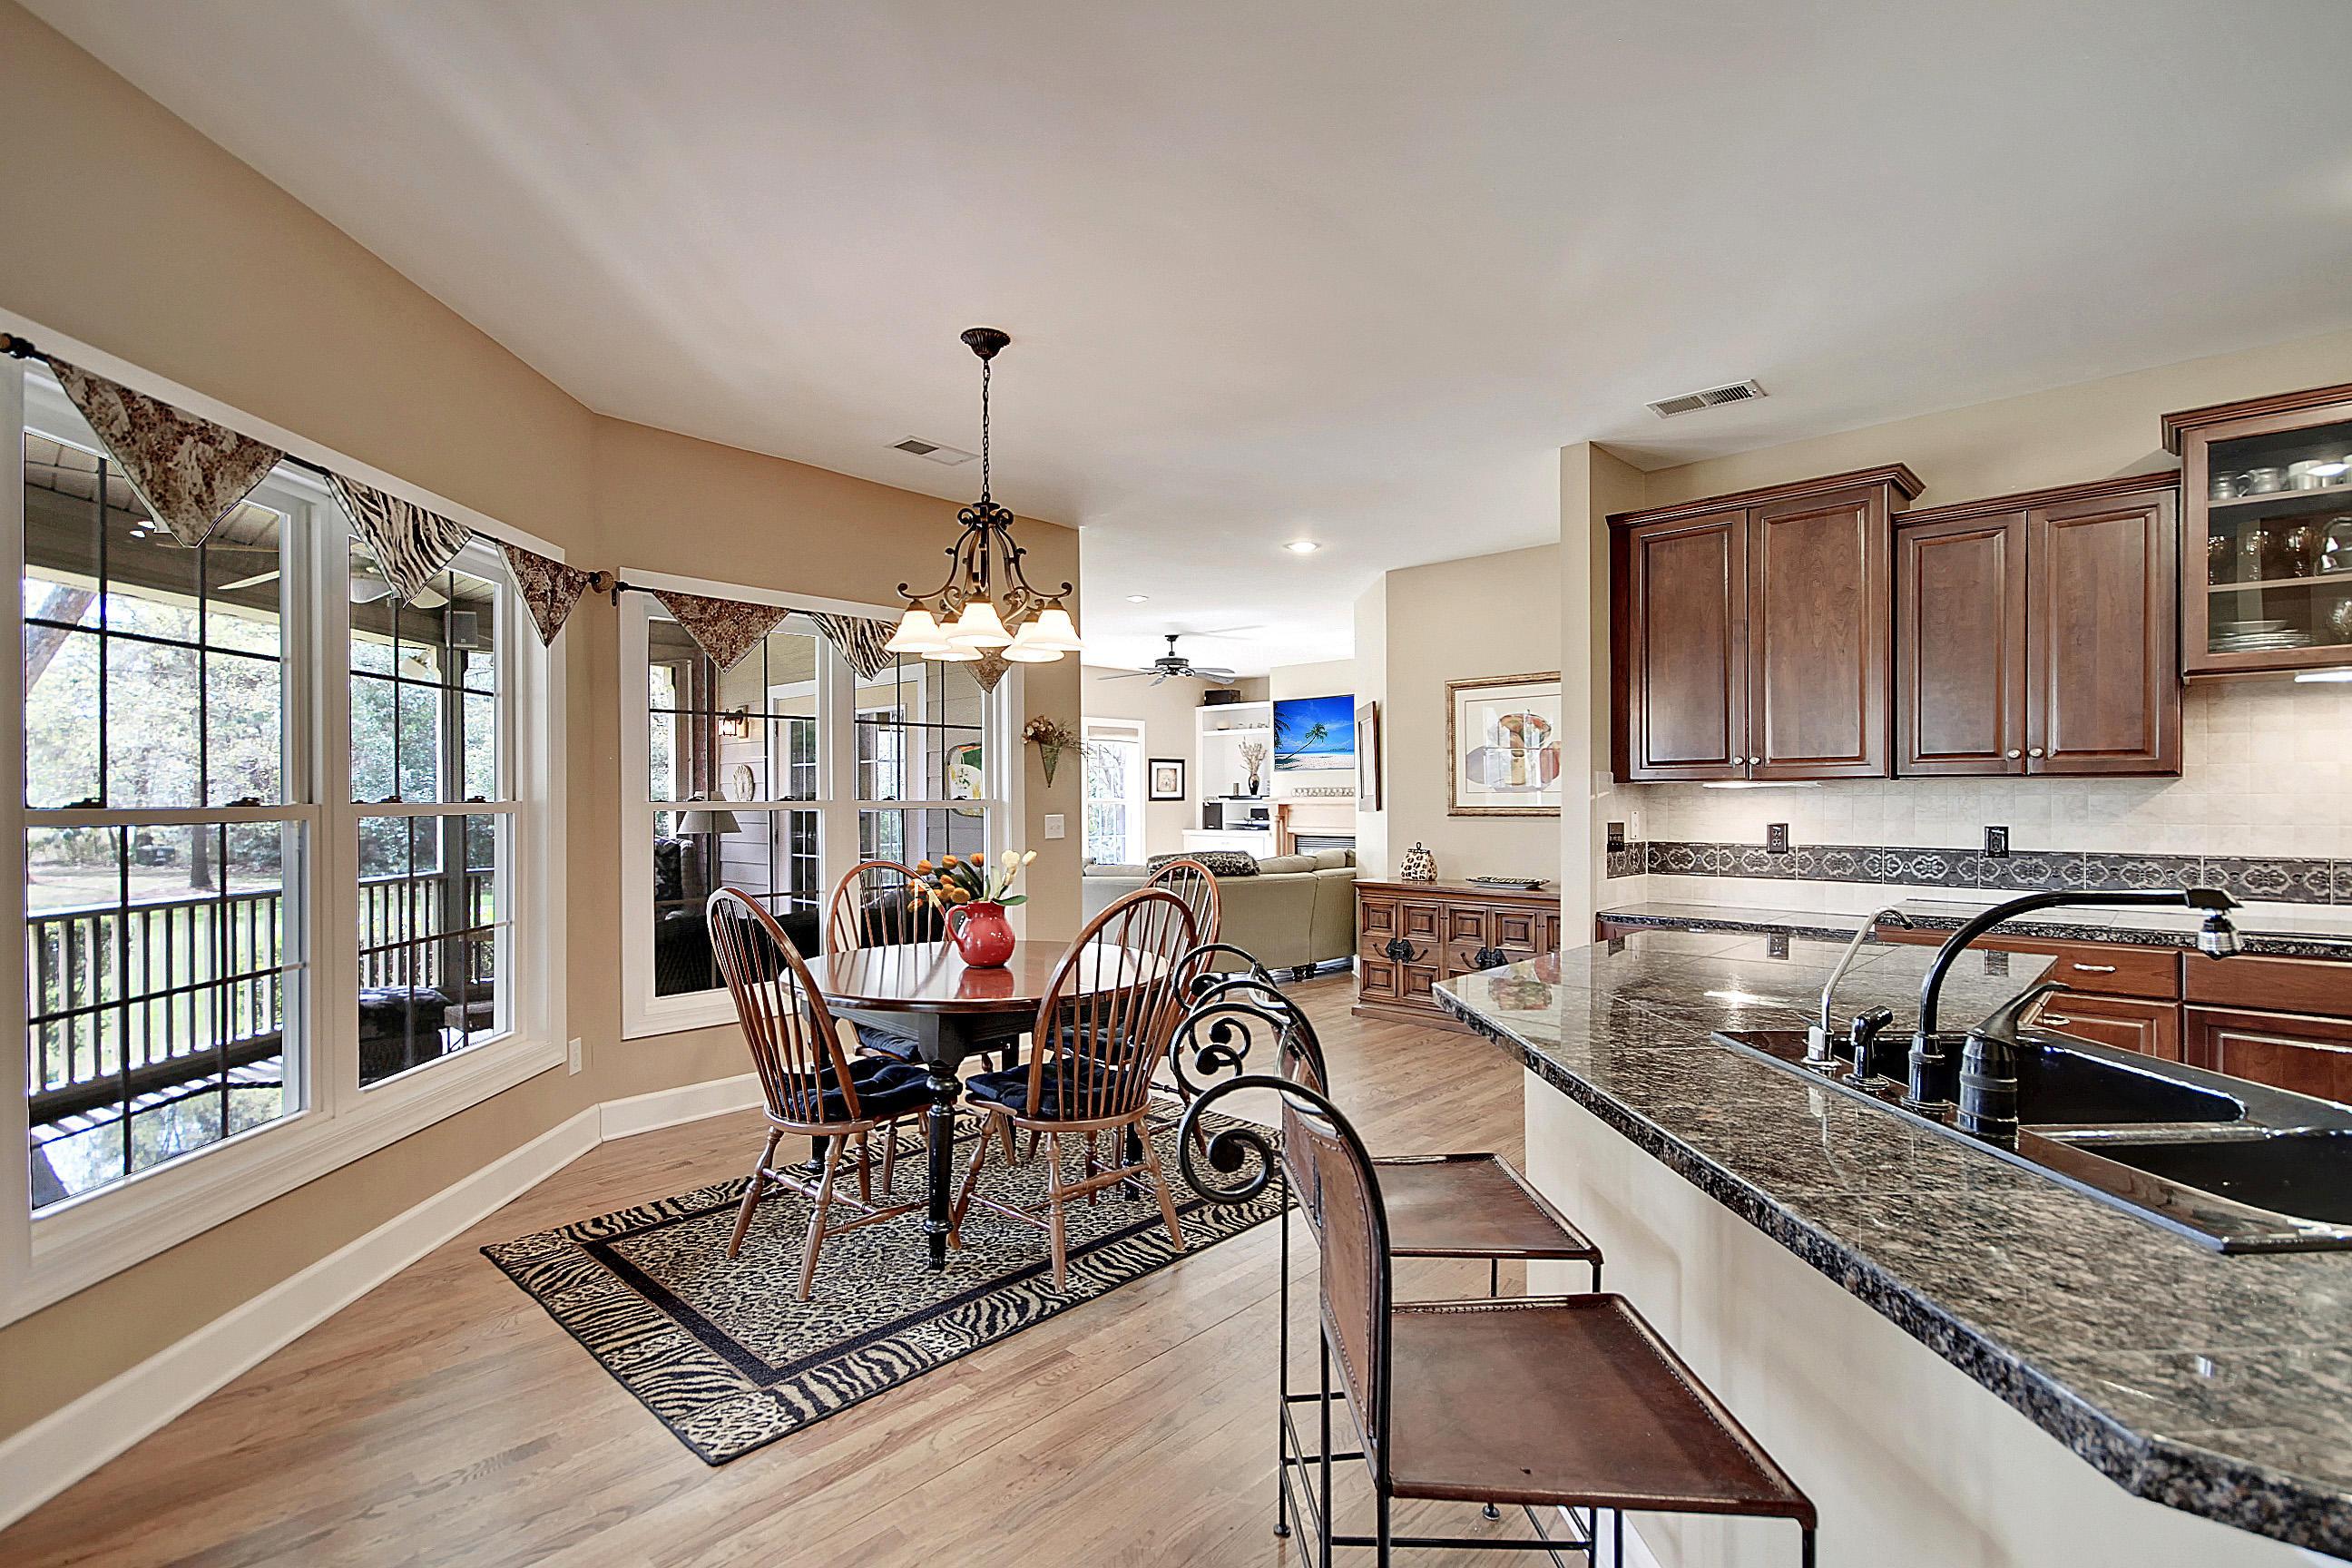 Dunes West Homes For Sale - 4002 Colonel Vanderhorst, Mount Pleasant, SC - 44